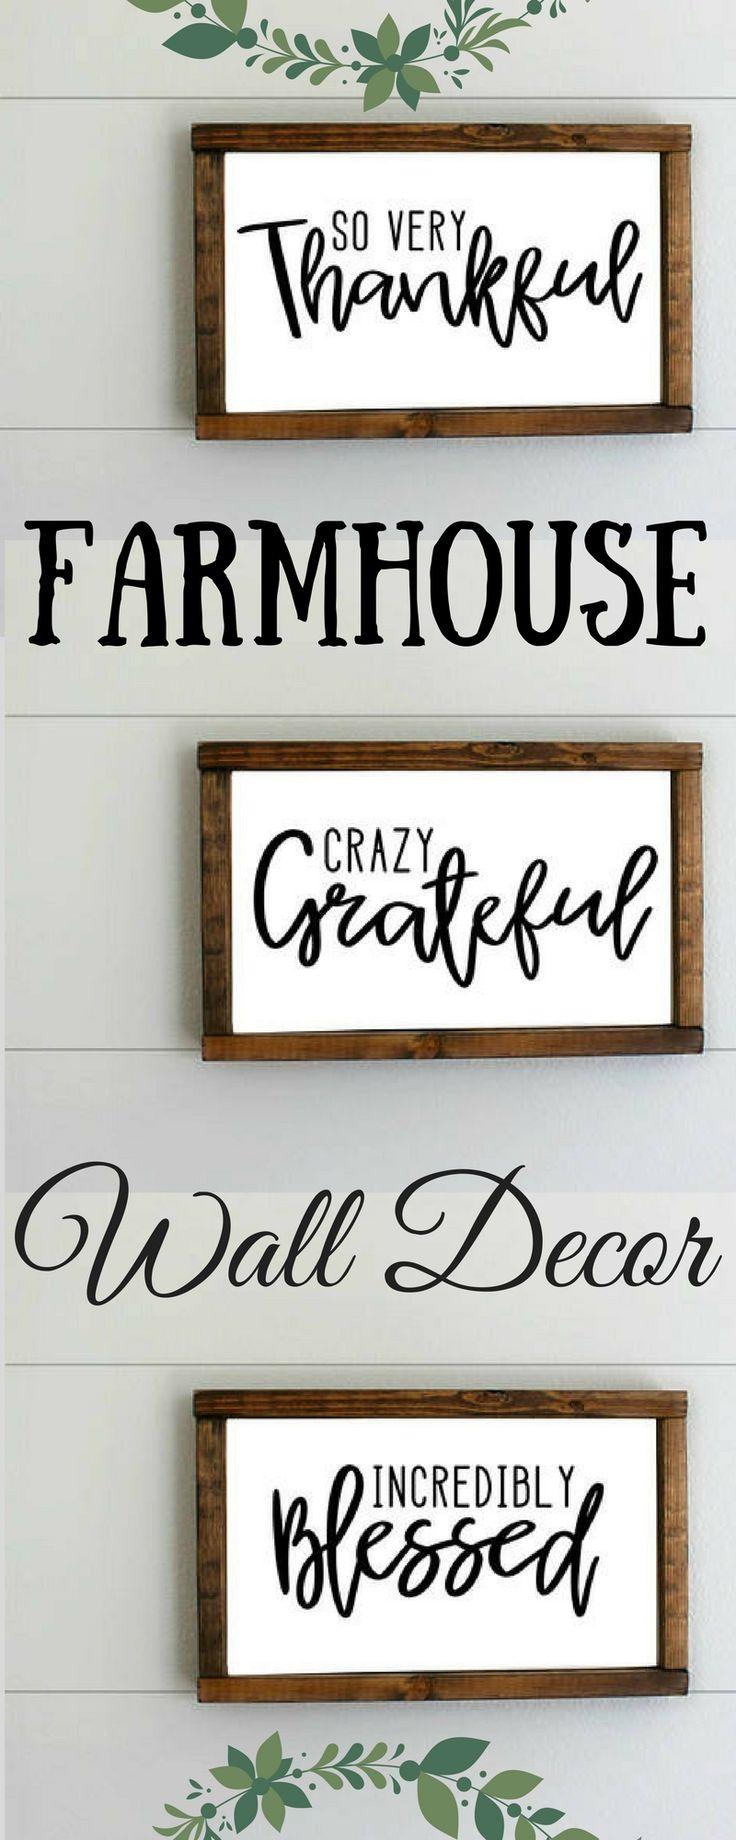 Love this farmhouse decor! home decor ideas, farmhouse, rustic, wood signs, diy, cheap, wall decor, prints, afflink